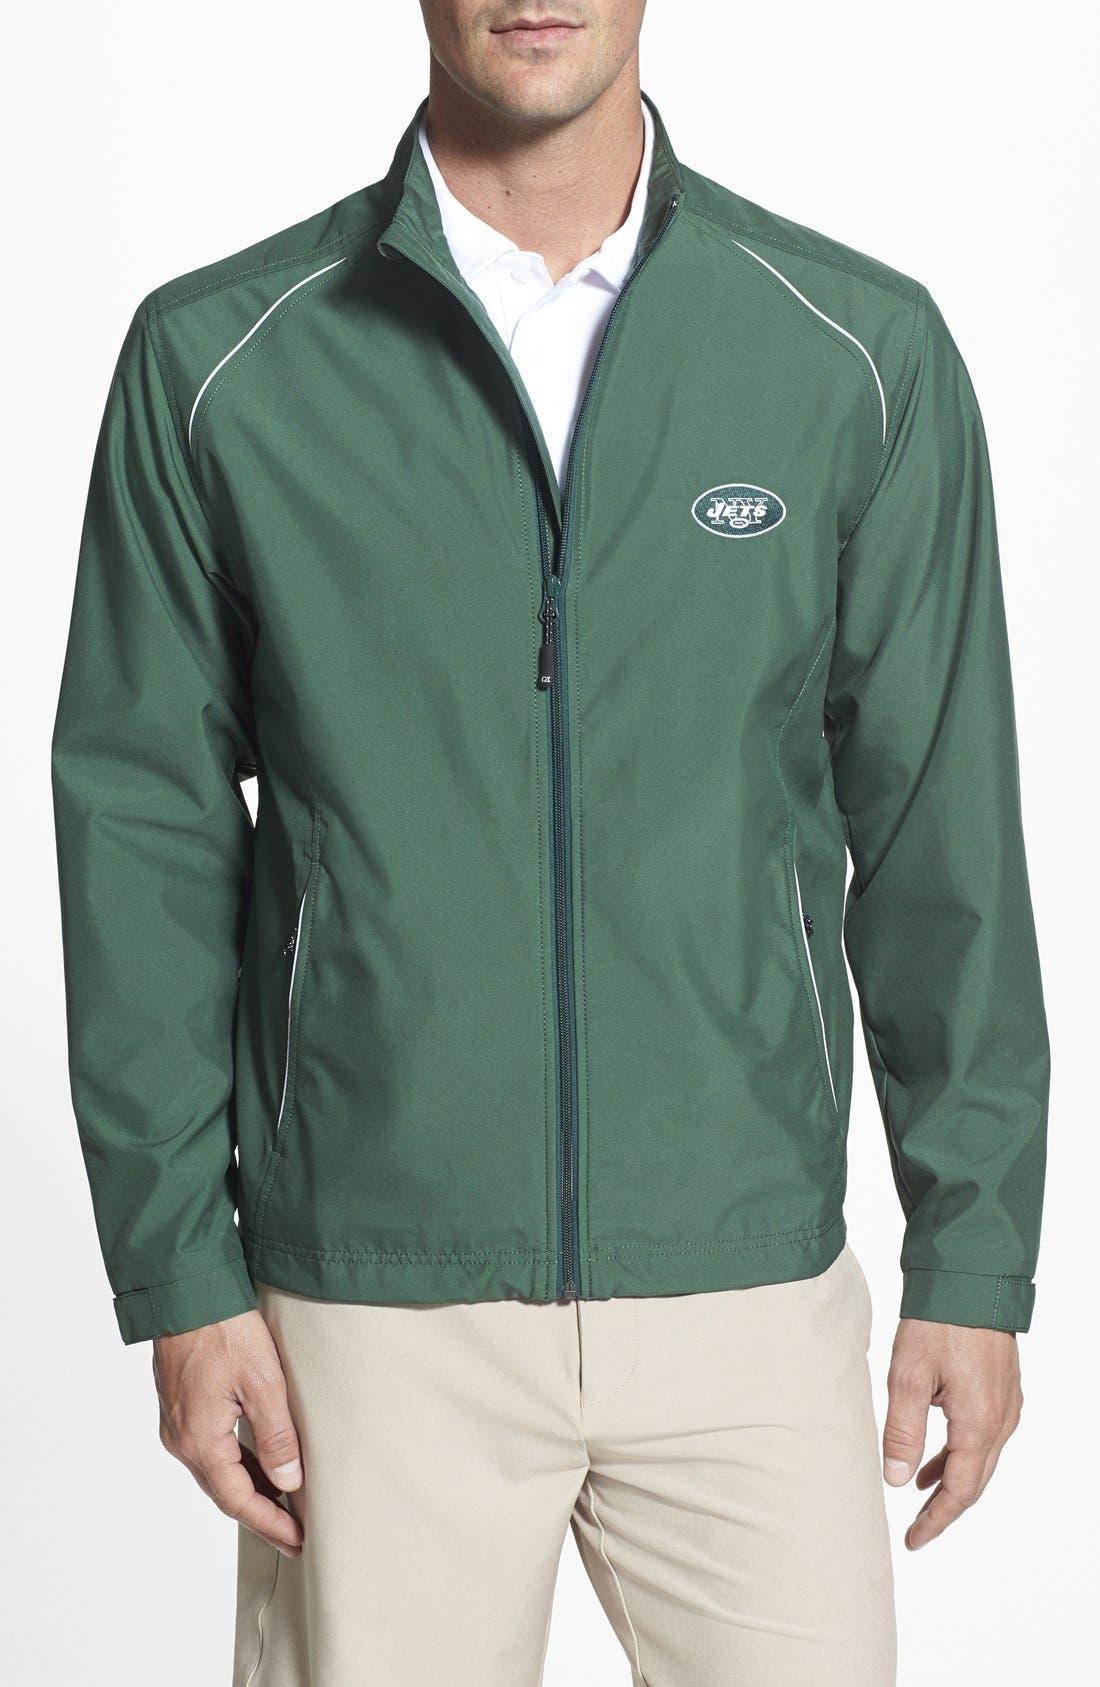 New York Jets - Beacon WeatherTec Wind & Water Resistant Jacket,                         Main,                         color, Hunter Green